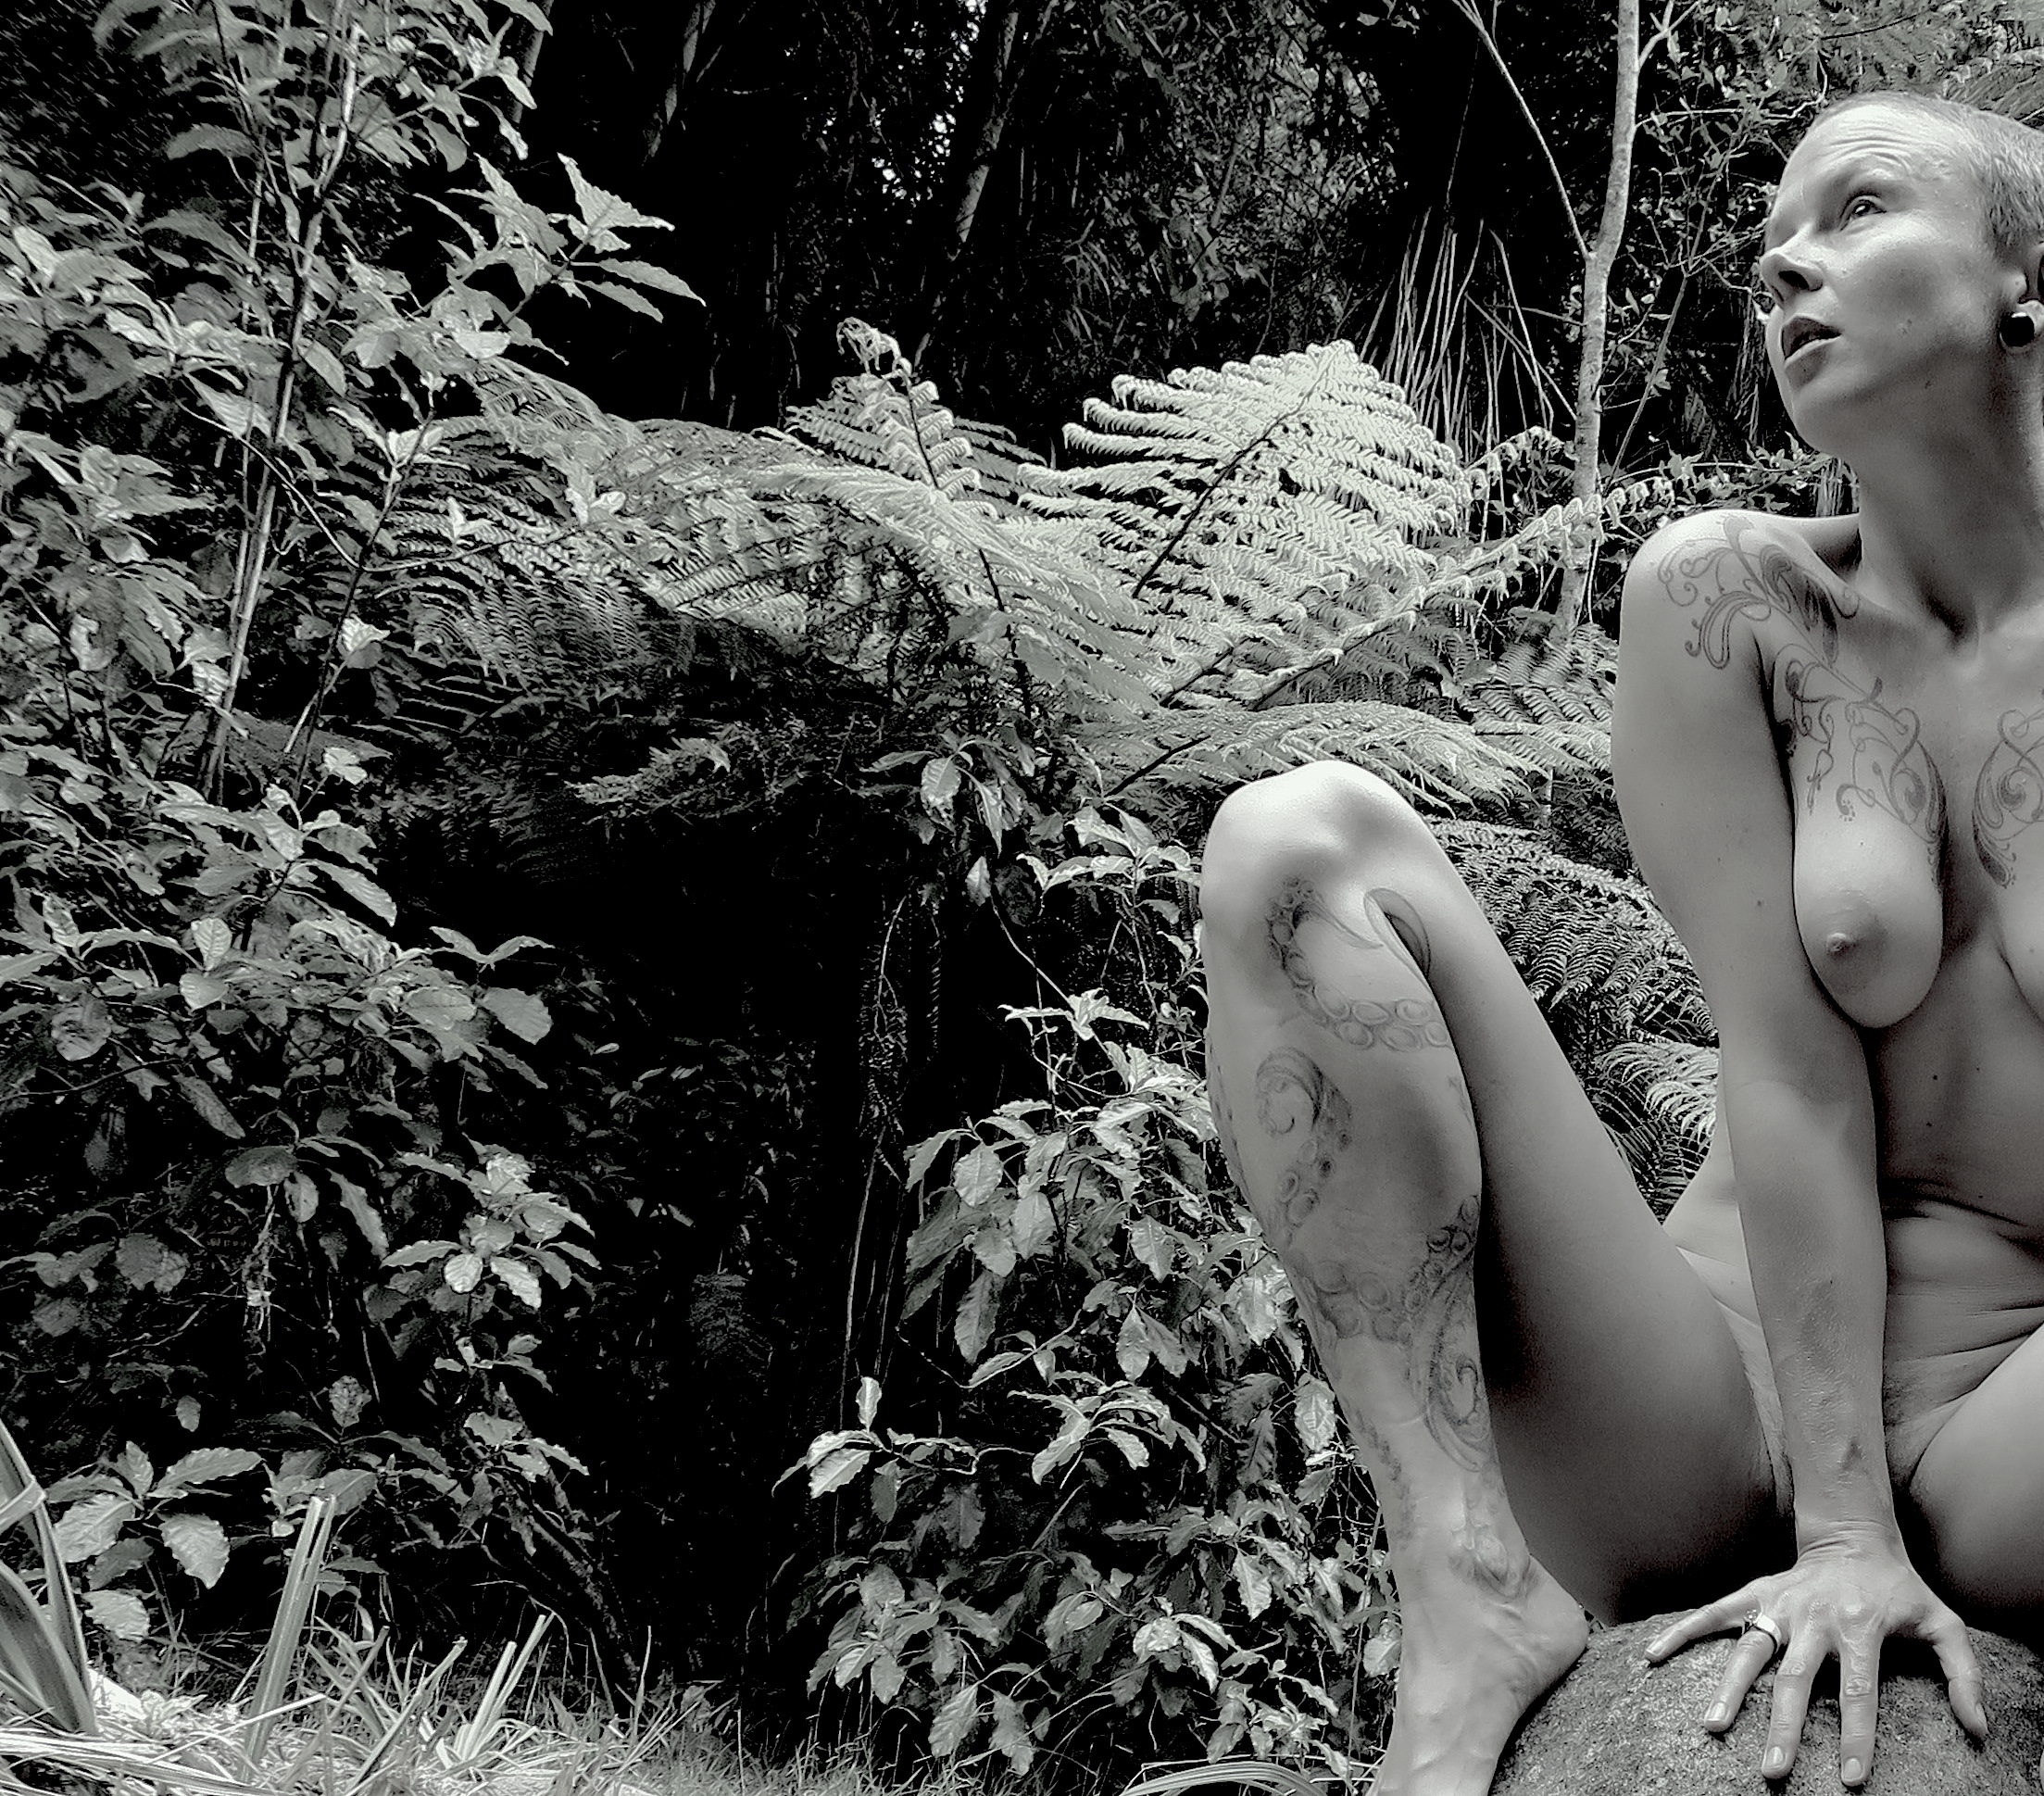 Earth & Eros: a ritual